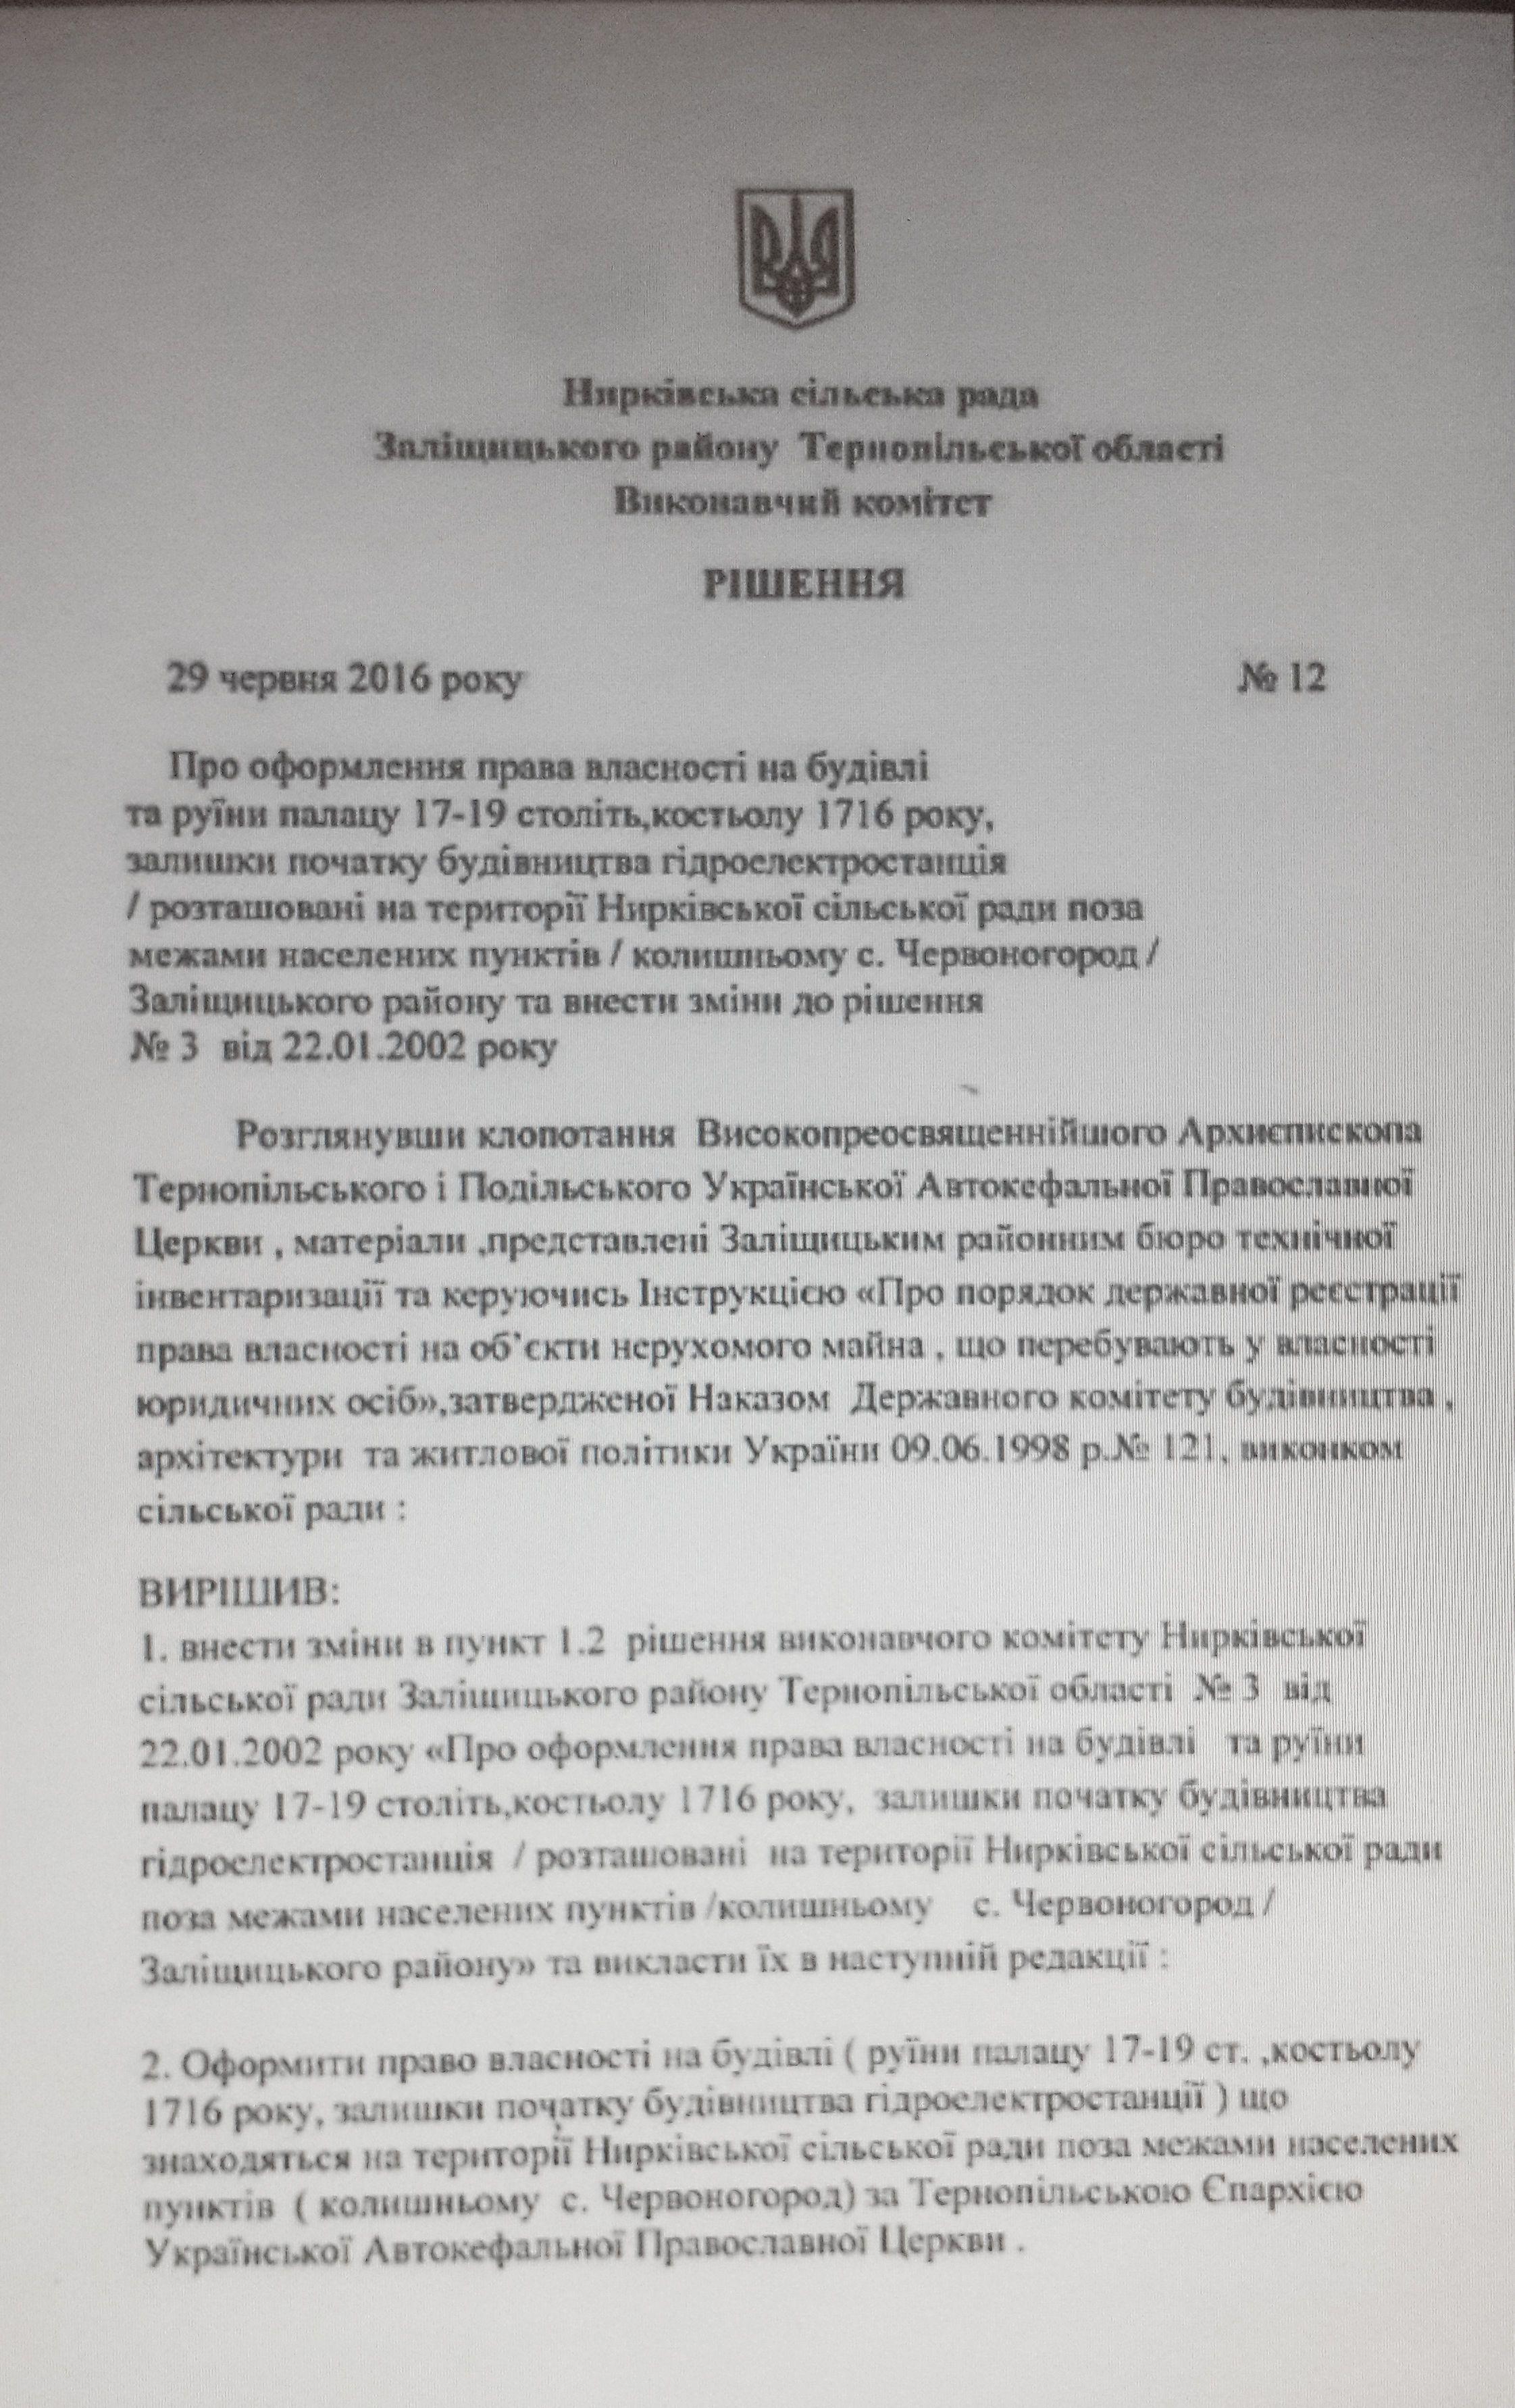 Документи по священику Мстиславу_6